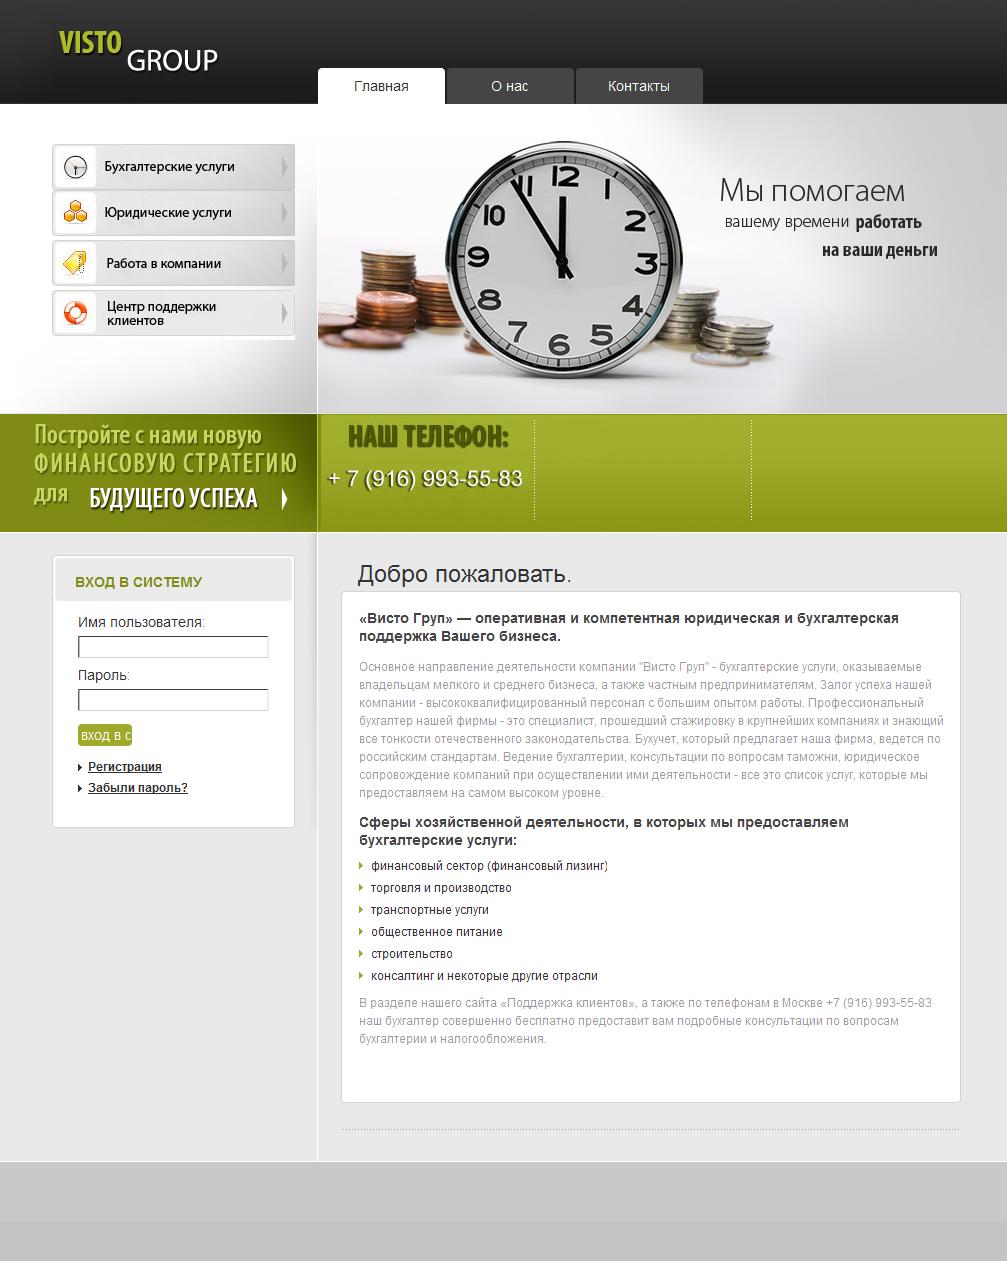 Разработка сайта VistoGroup |  Drupal